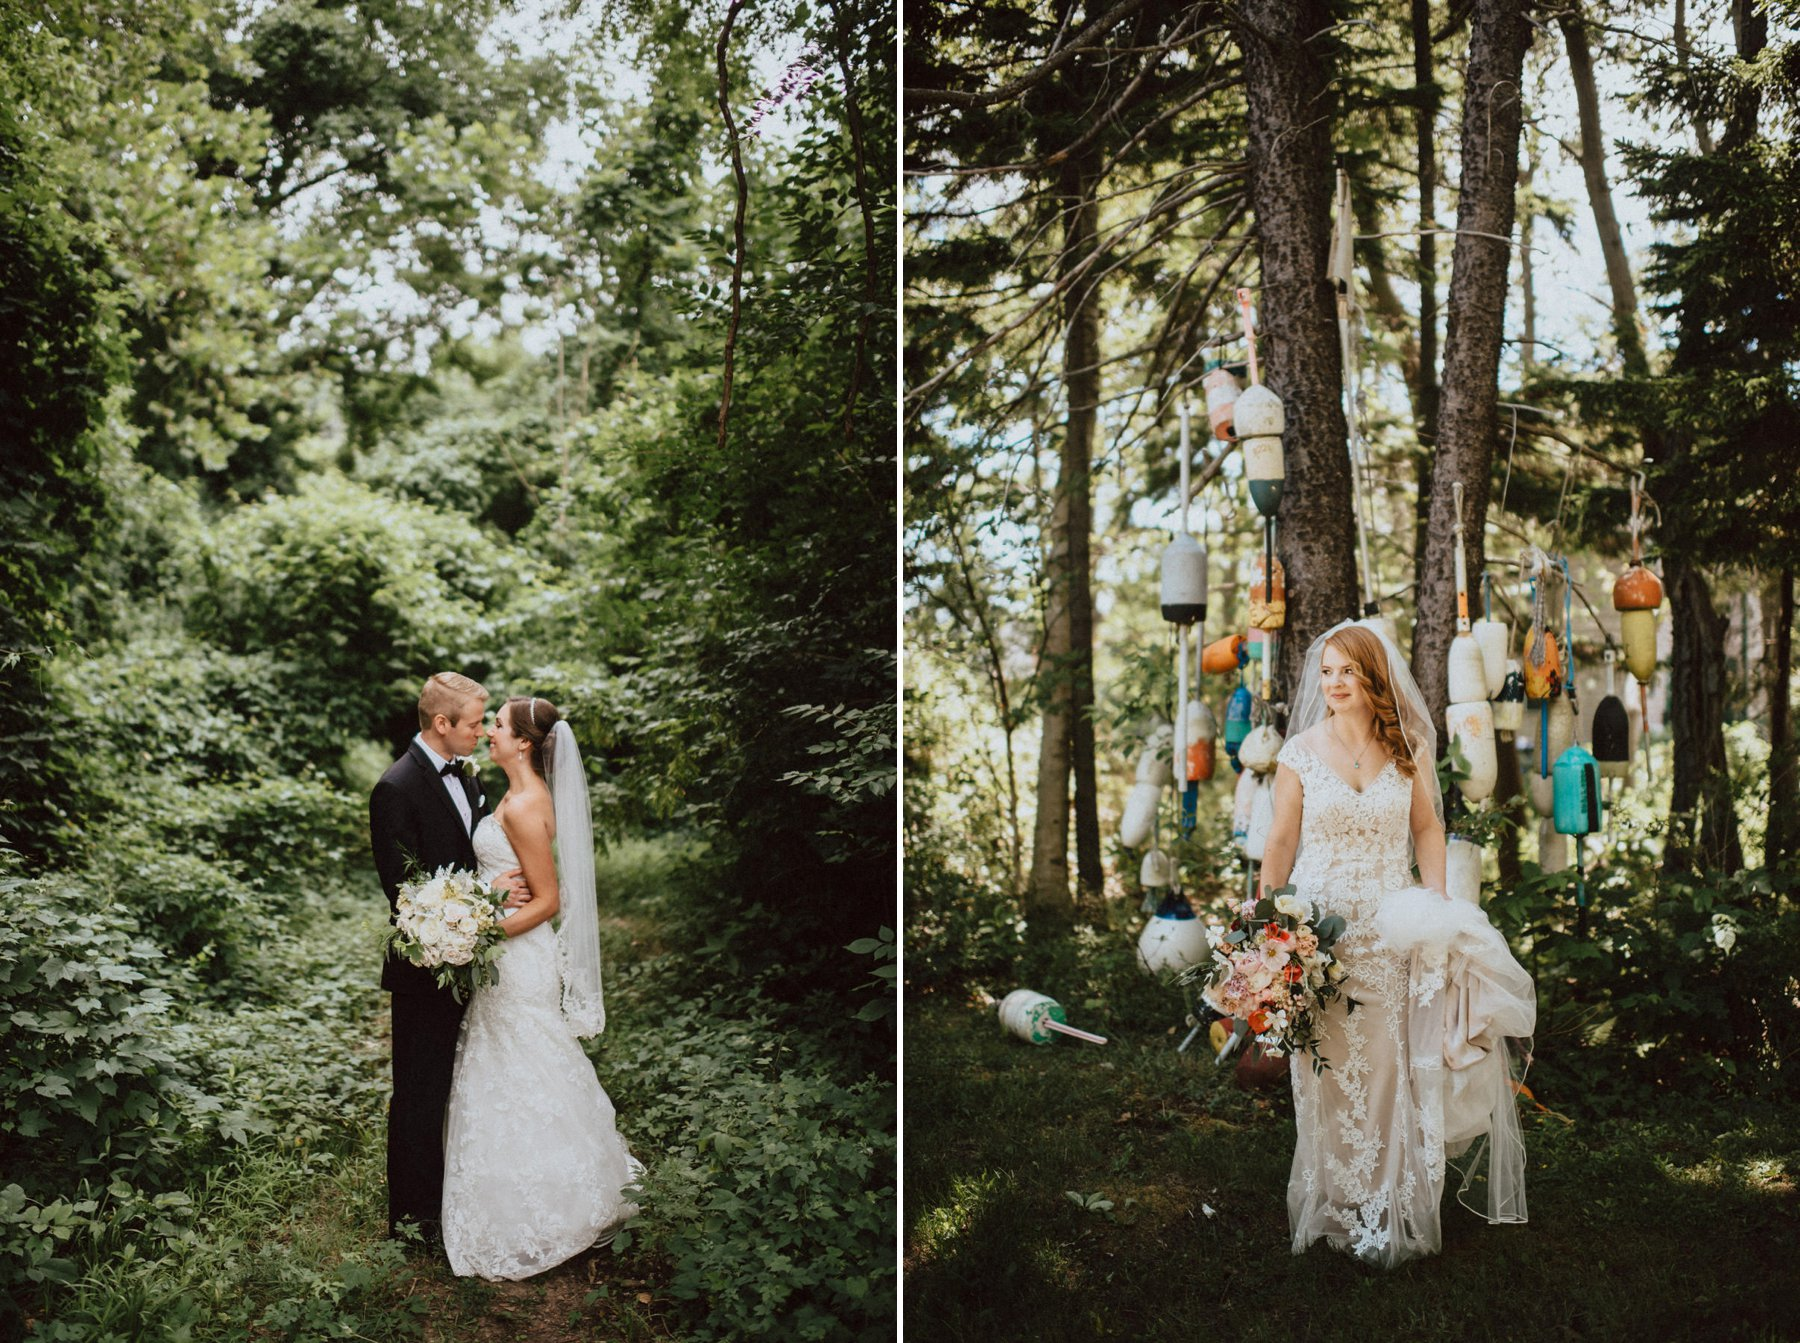 260-whitemarsh-valley-country-club-wedding-14.jpg